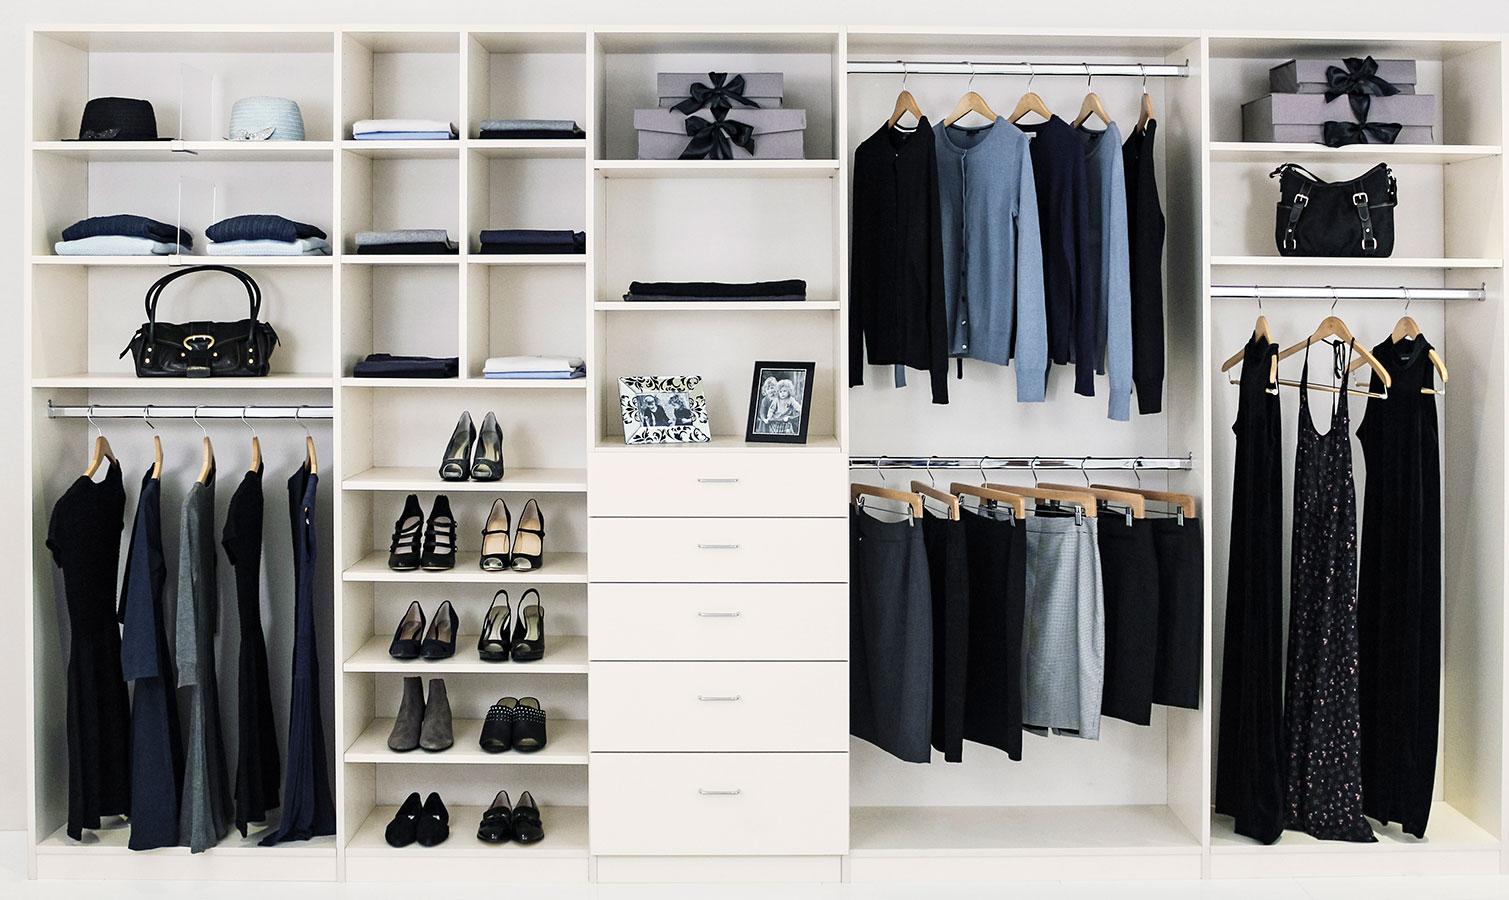 How Much Do Closet Factory Custom Closets Cost?